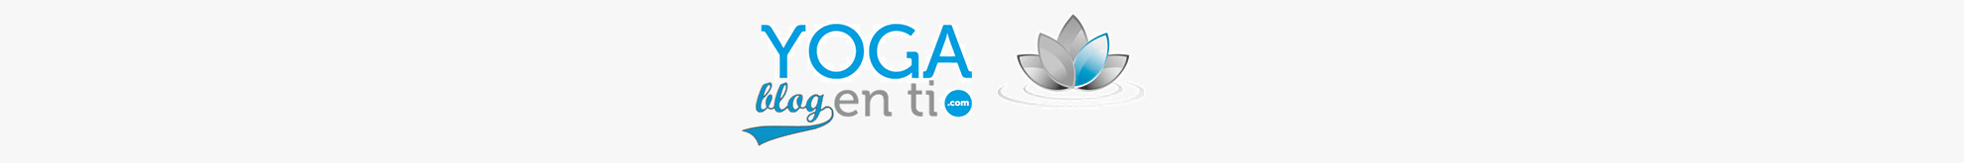 Blog Yogaenti